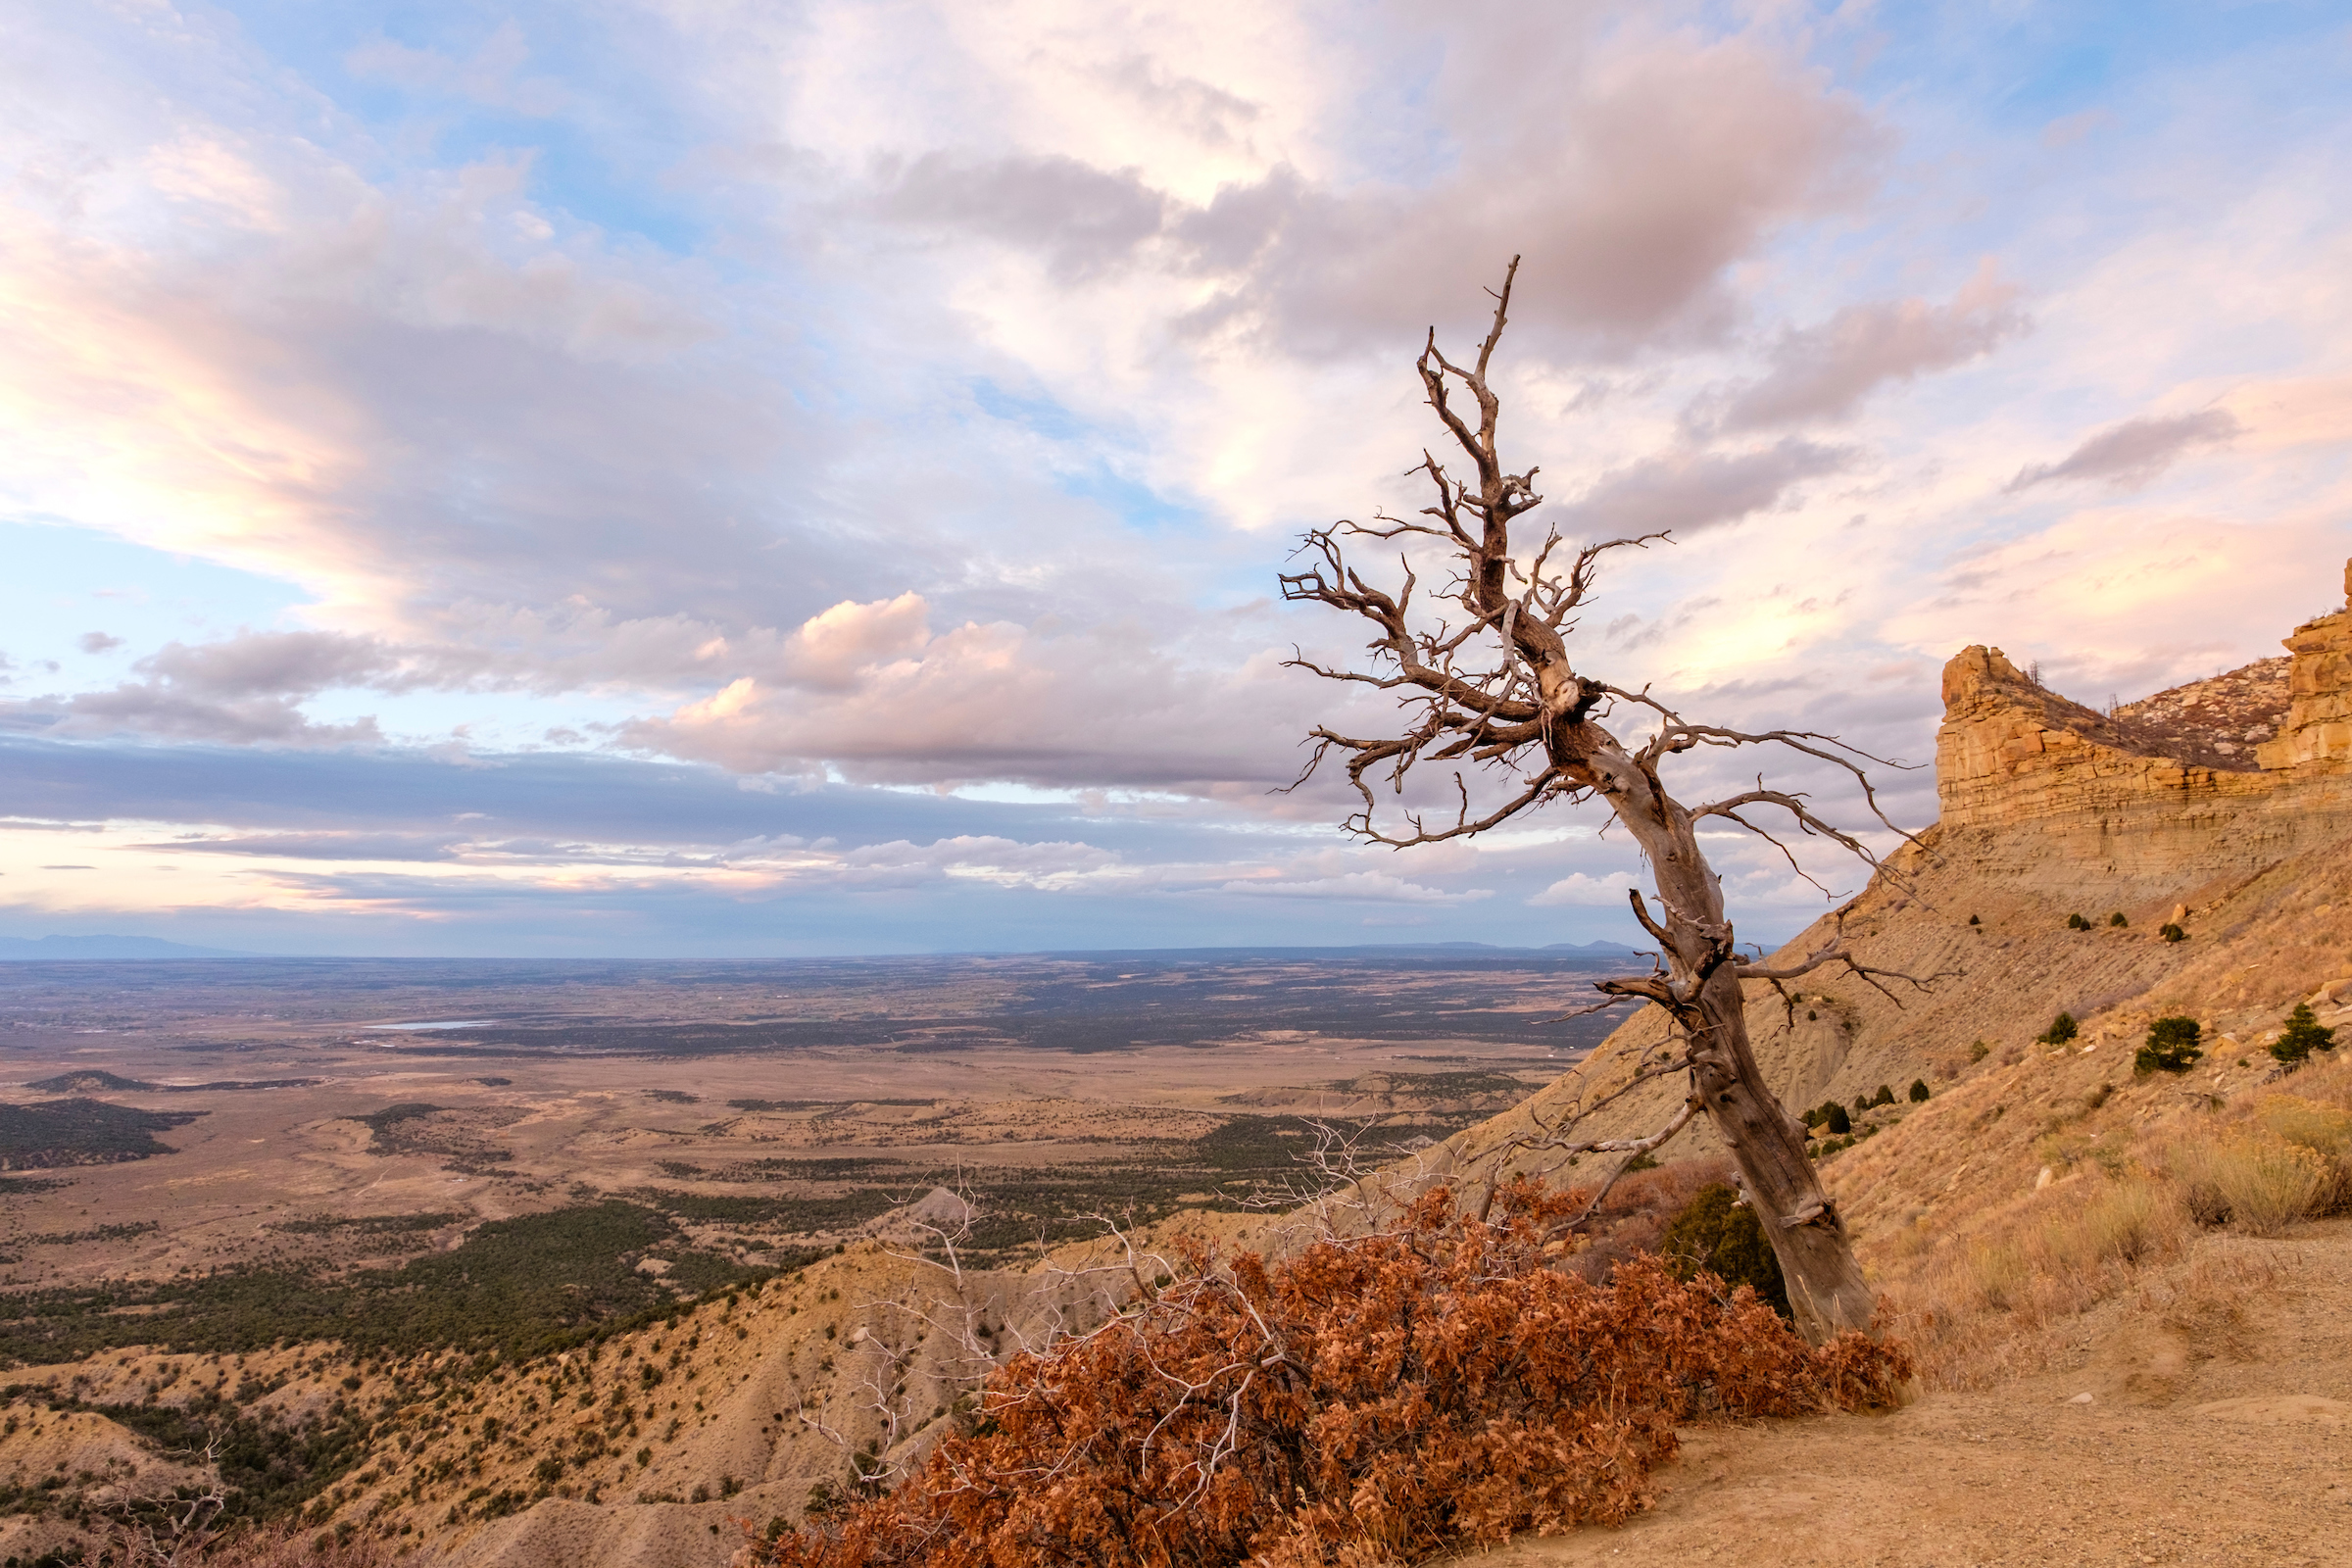 Descending the Mesa Top Loop Road at sunset wields stunning views.